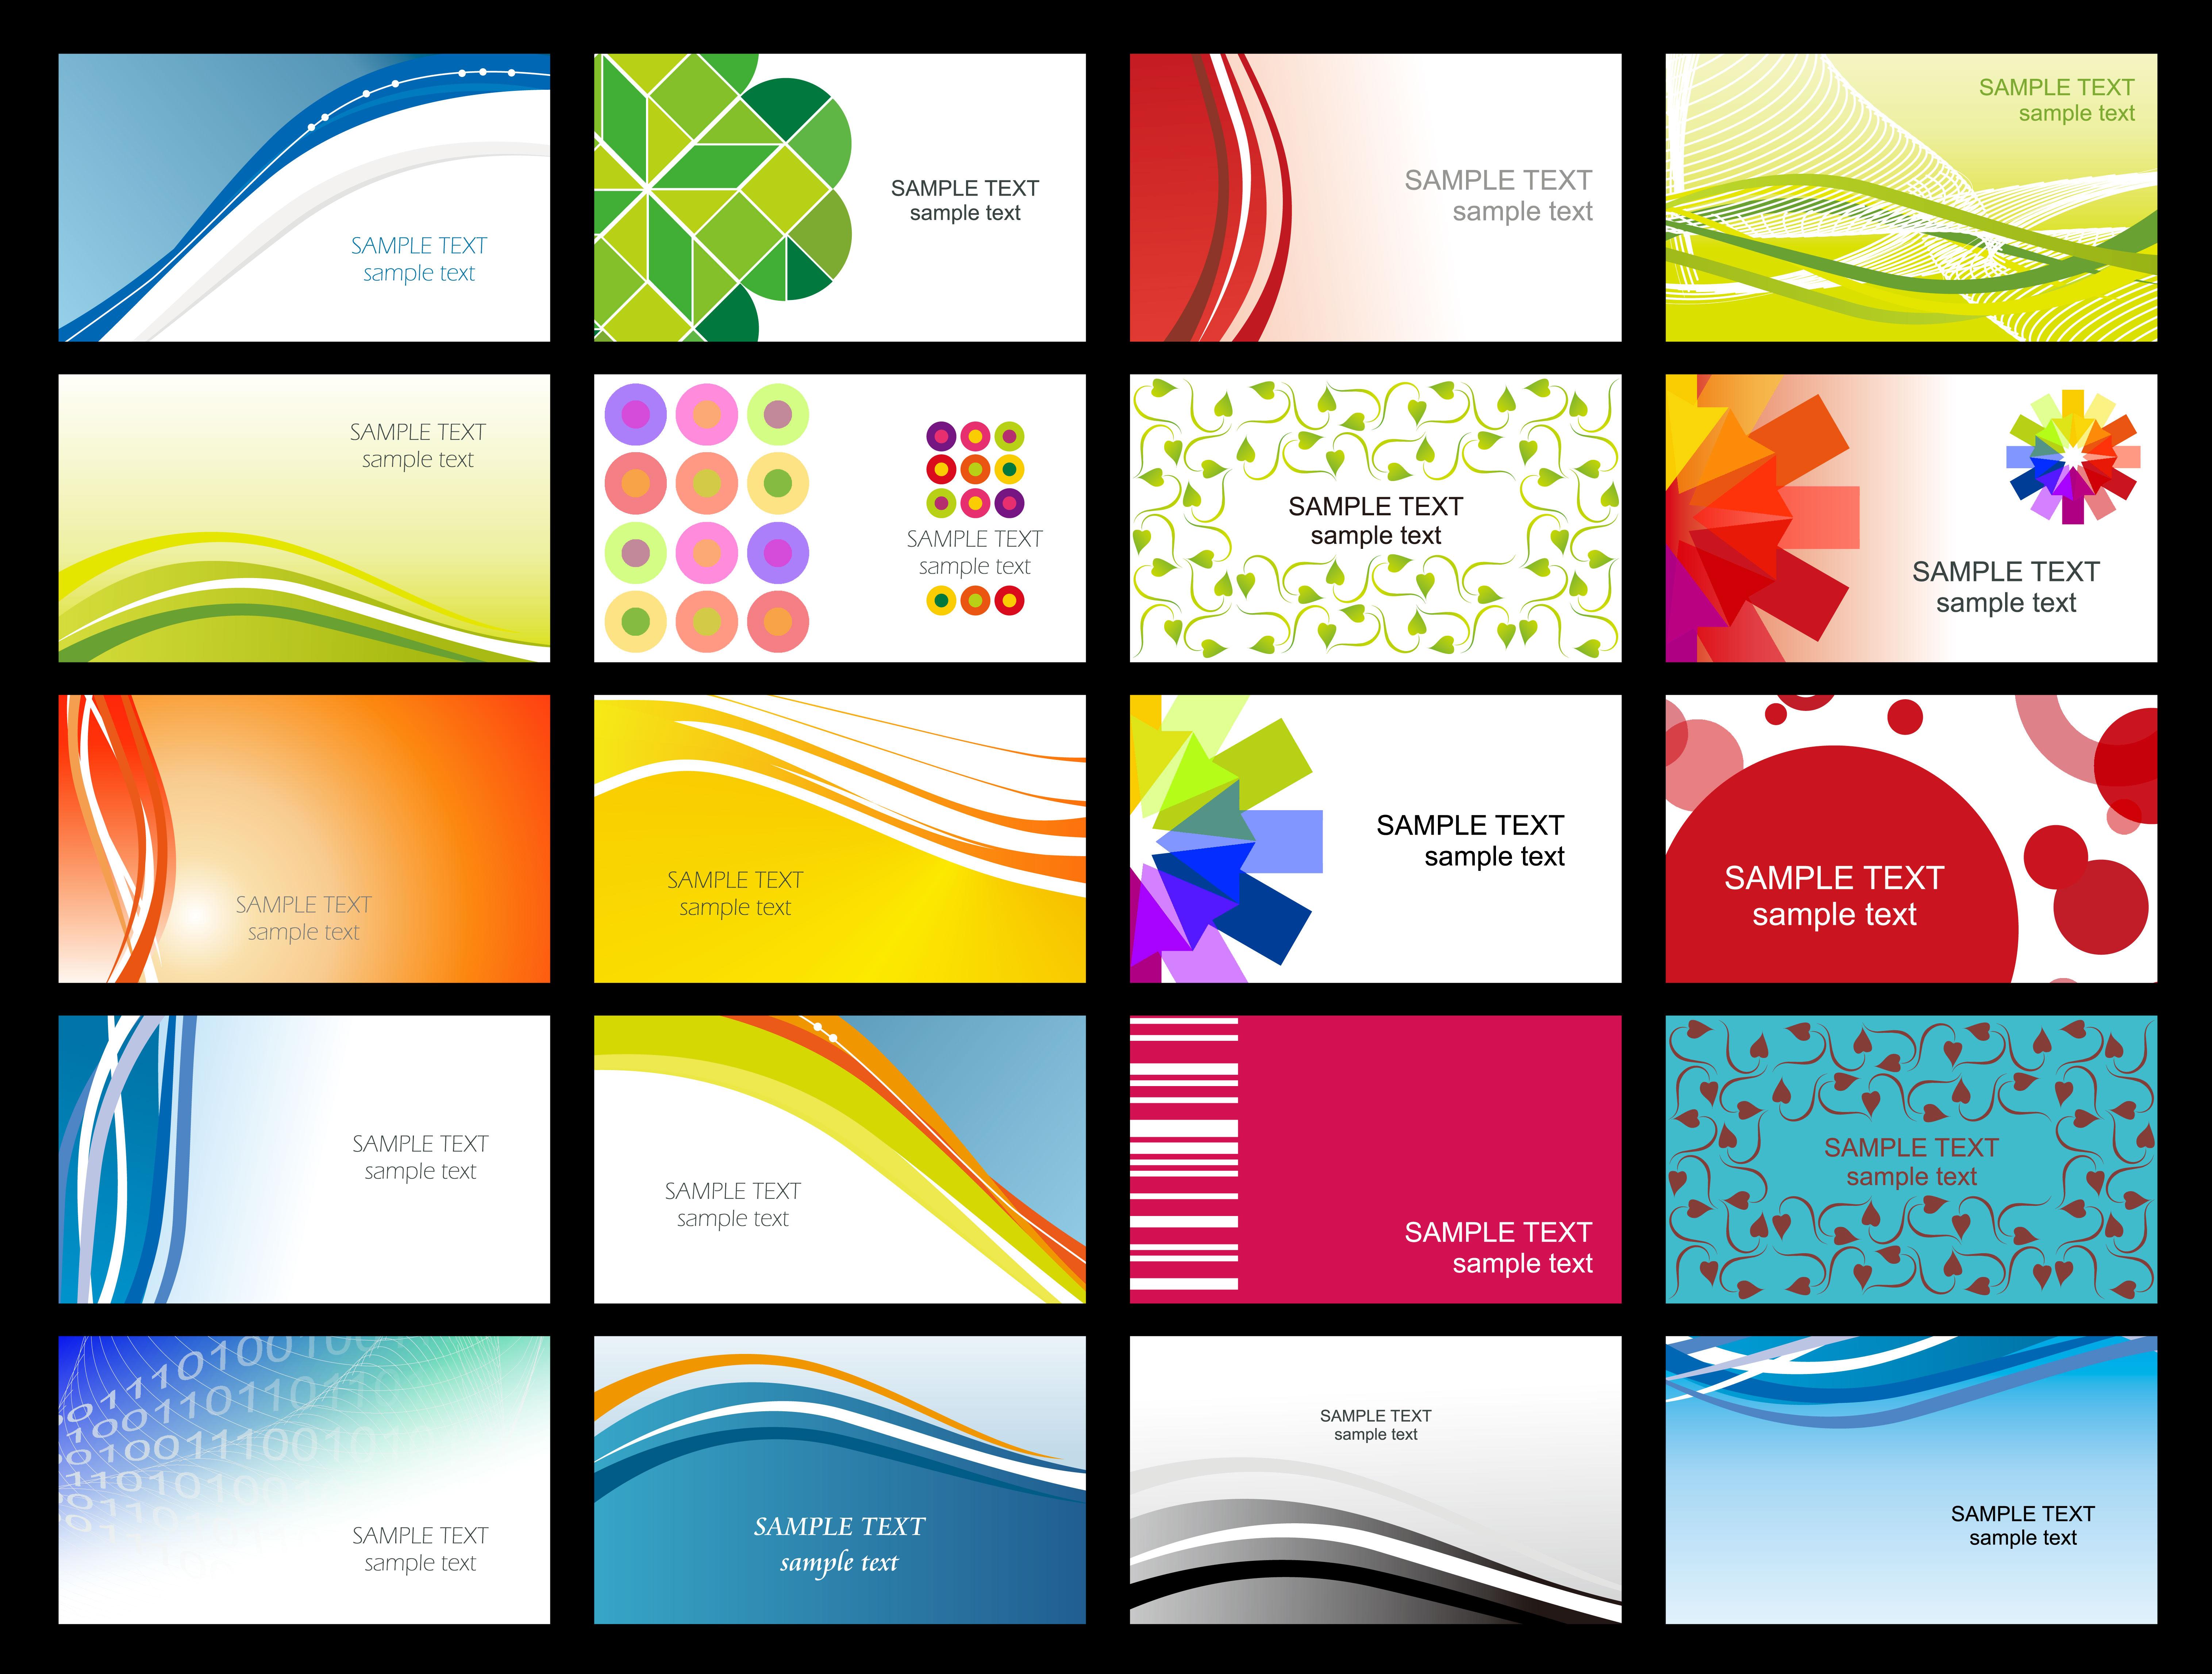 Free Printable Business Card Templates Sample | Get Sniffer - Free Printable Business Templates